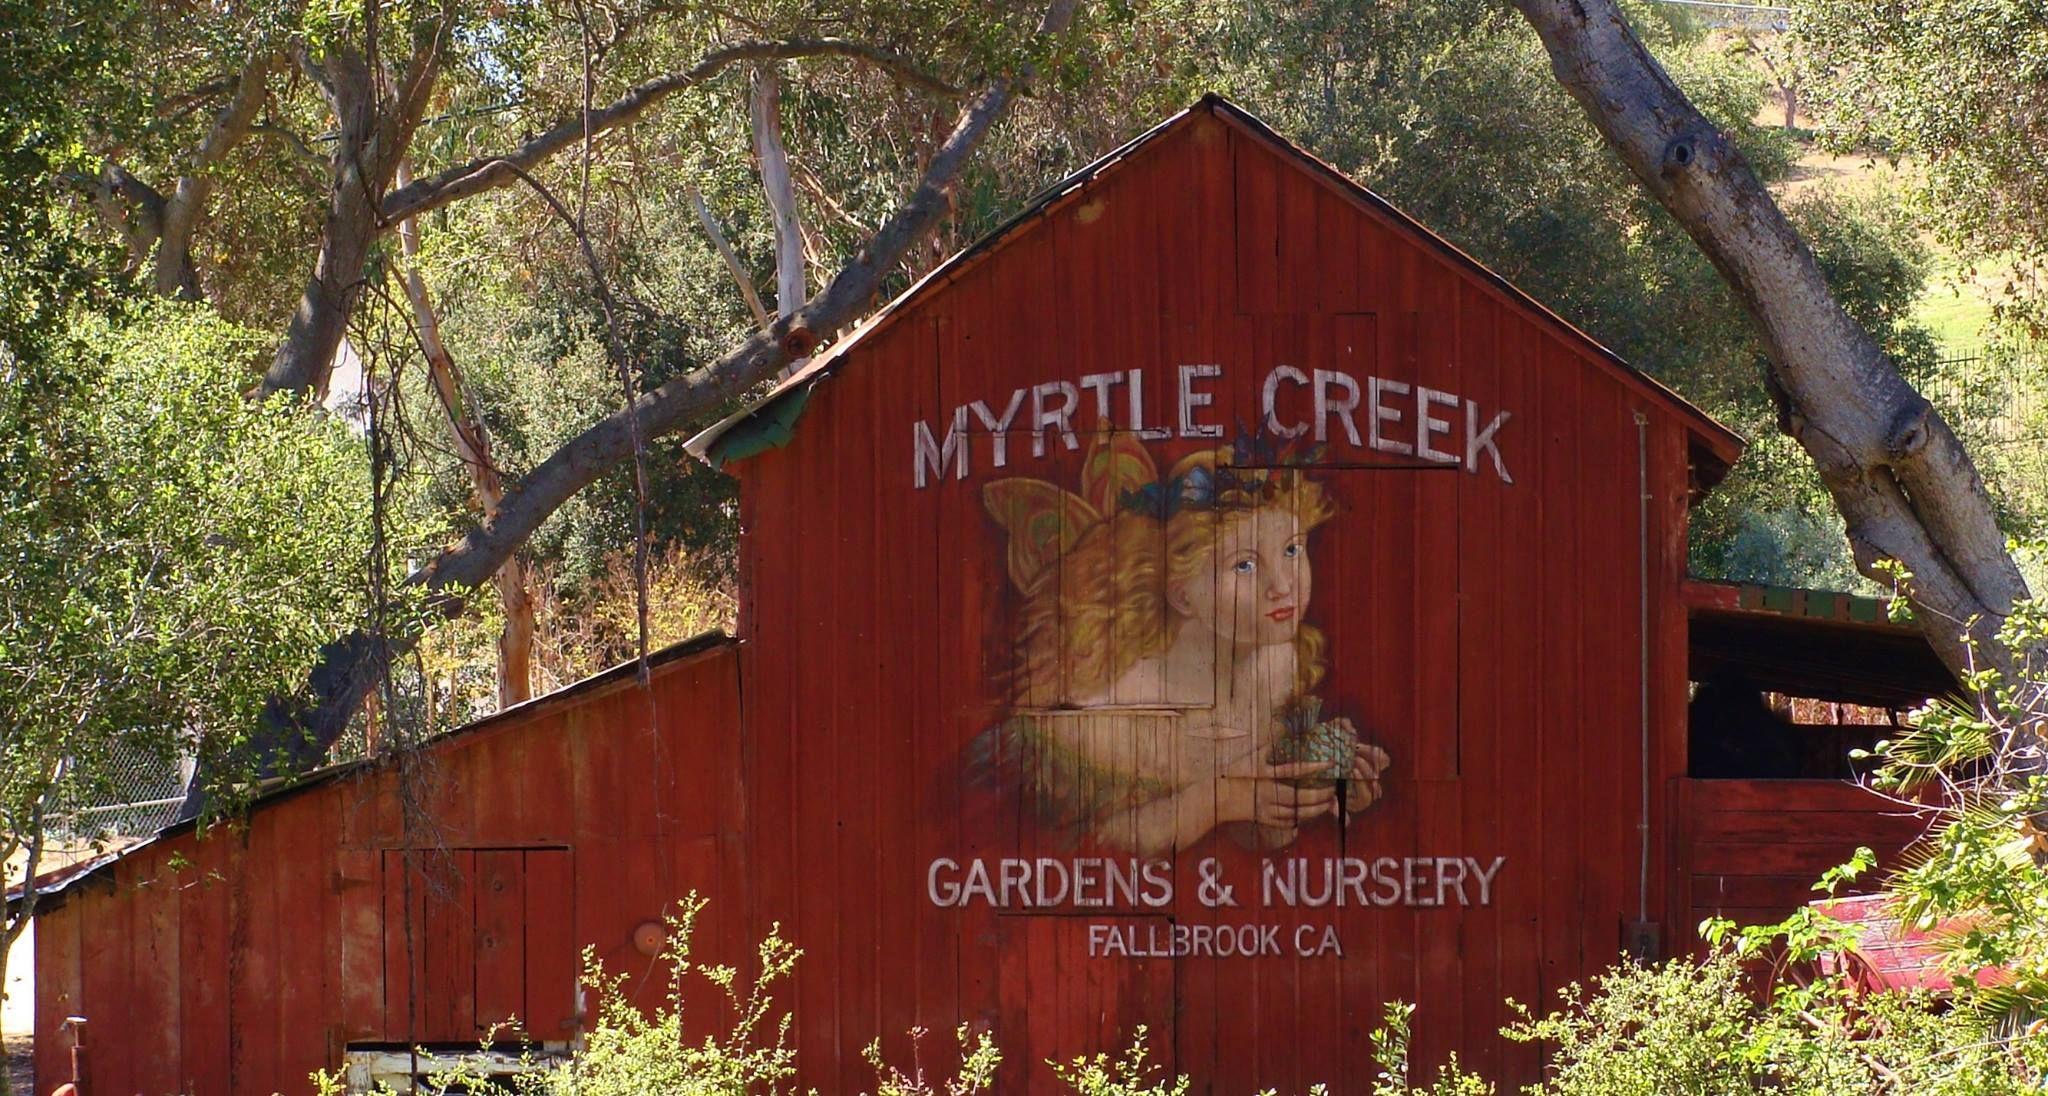 b6d54235e1756488827684aa6ba3166f - Myrtle Creek Botanical Gardens & Nursery Fallbrook Ca